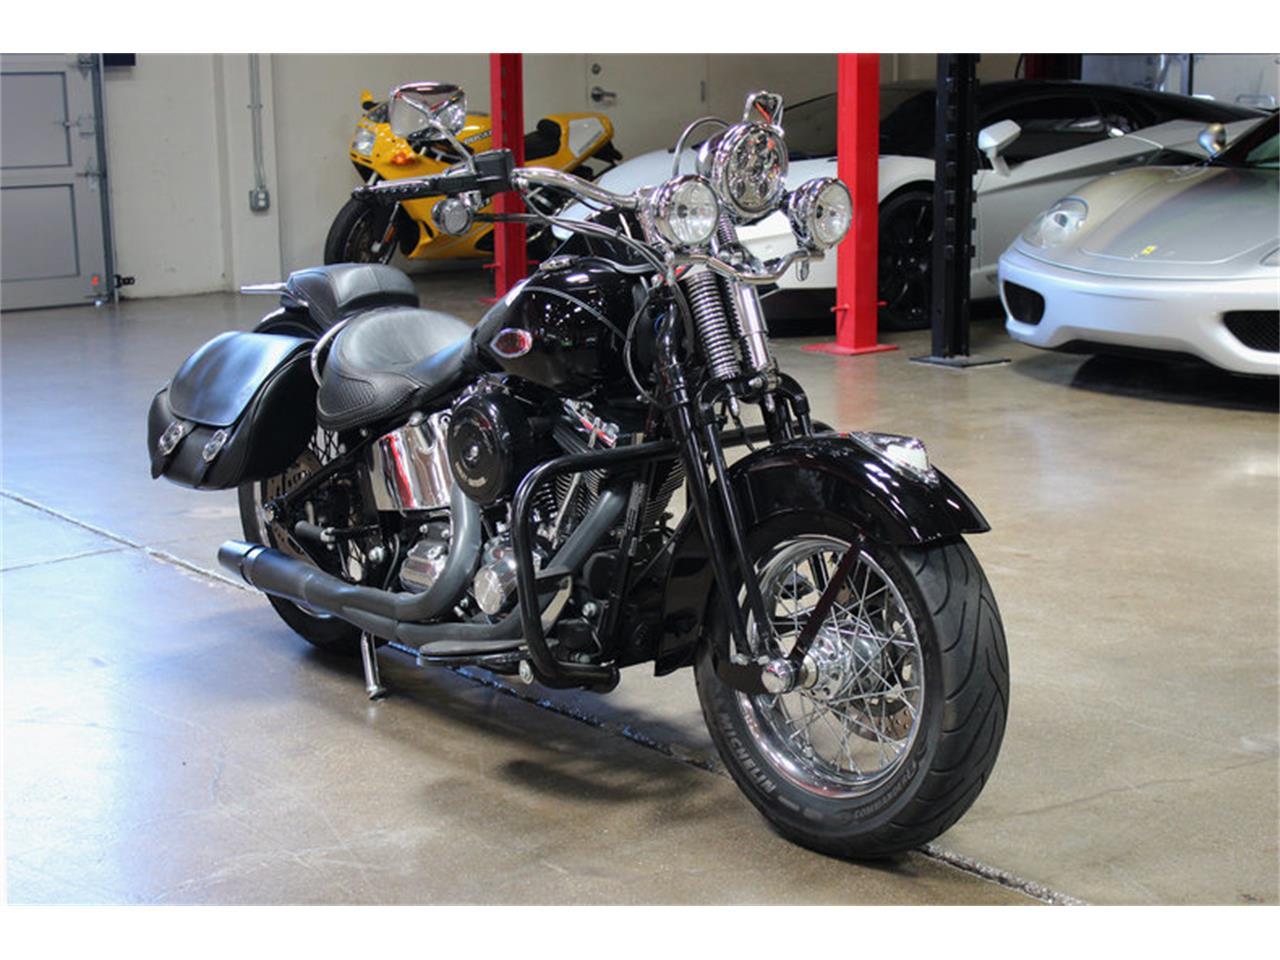 Harley Davidson Deuce >> 2011 Harley Davidson Deuce For Sale Classiccars Com Cc 1016559